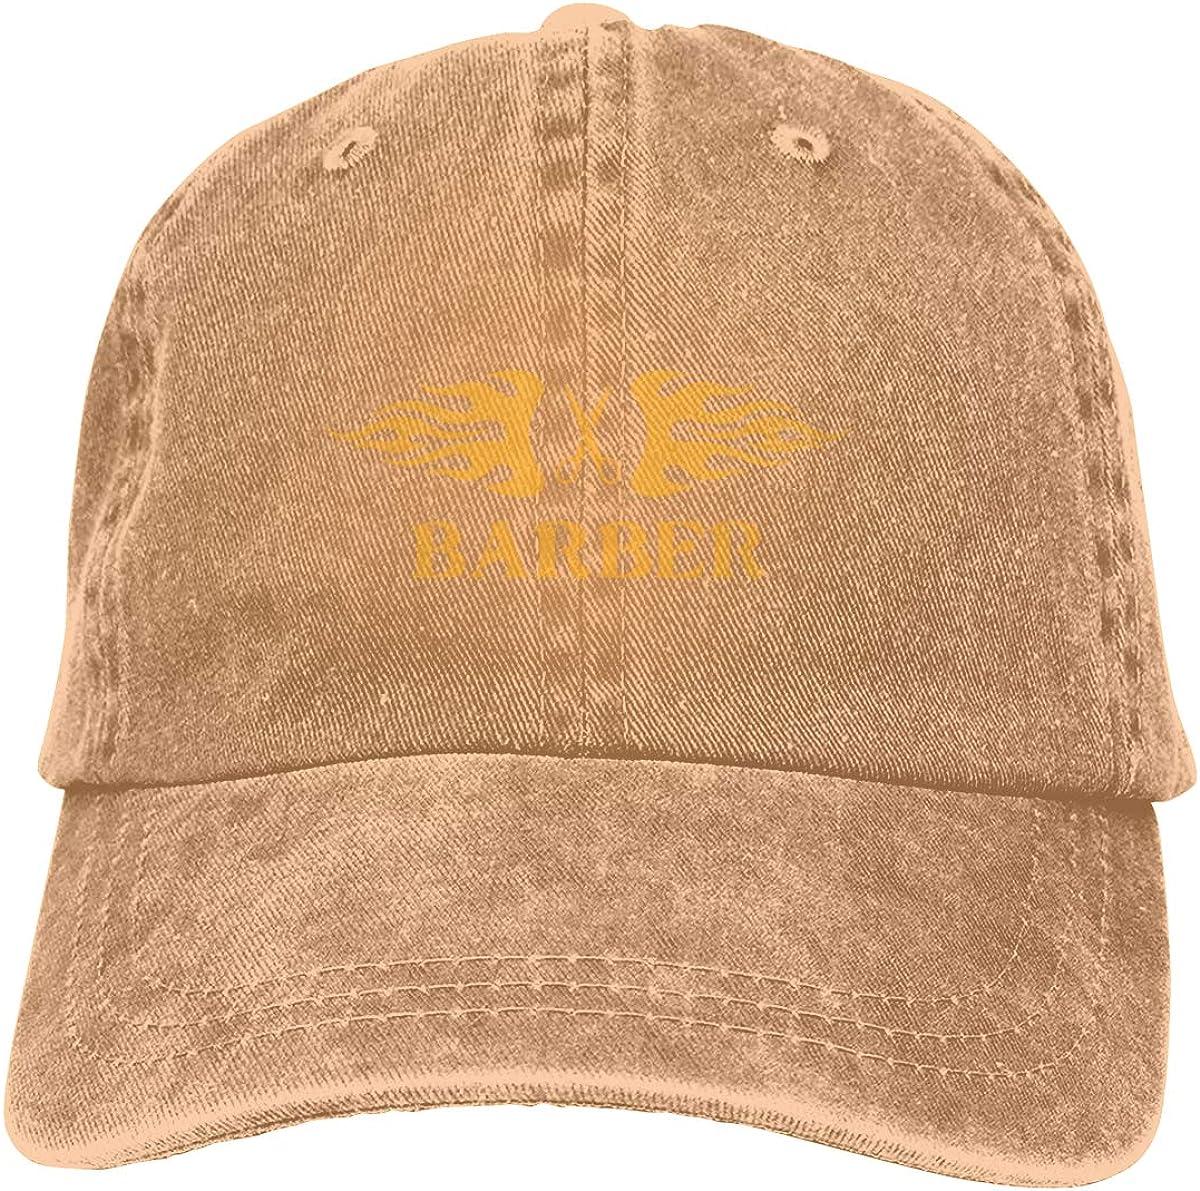 Barber Red Adult Custom Cowboy Sun Hat Adjustable Baseball Cap